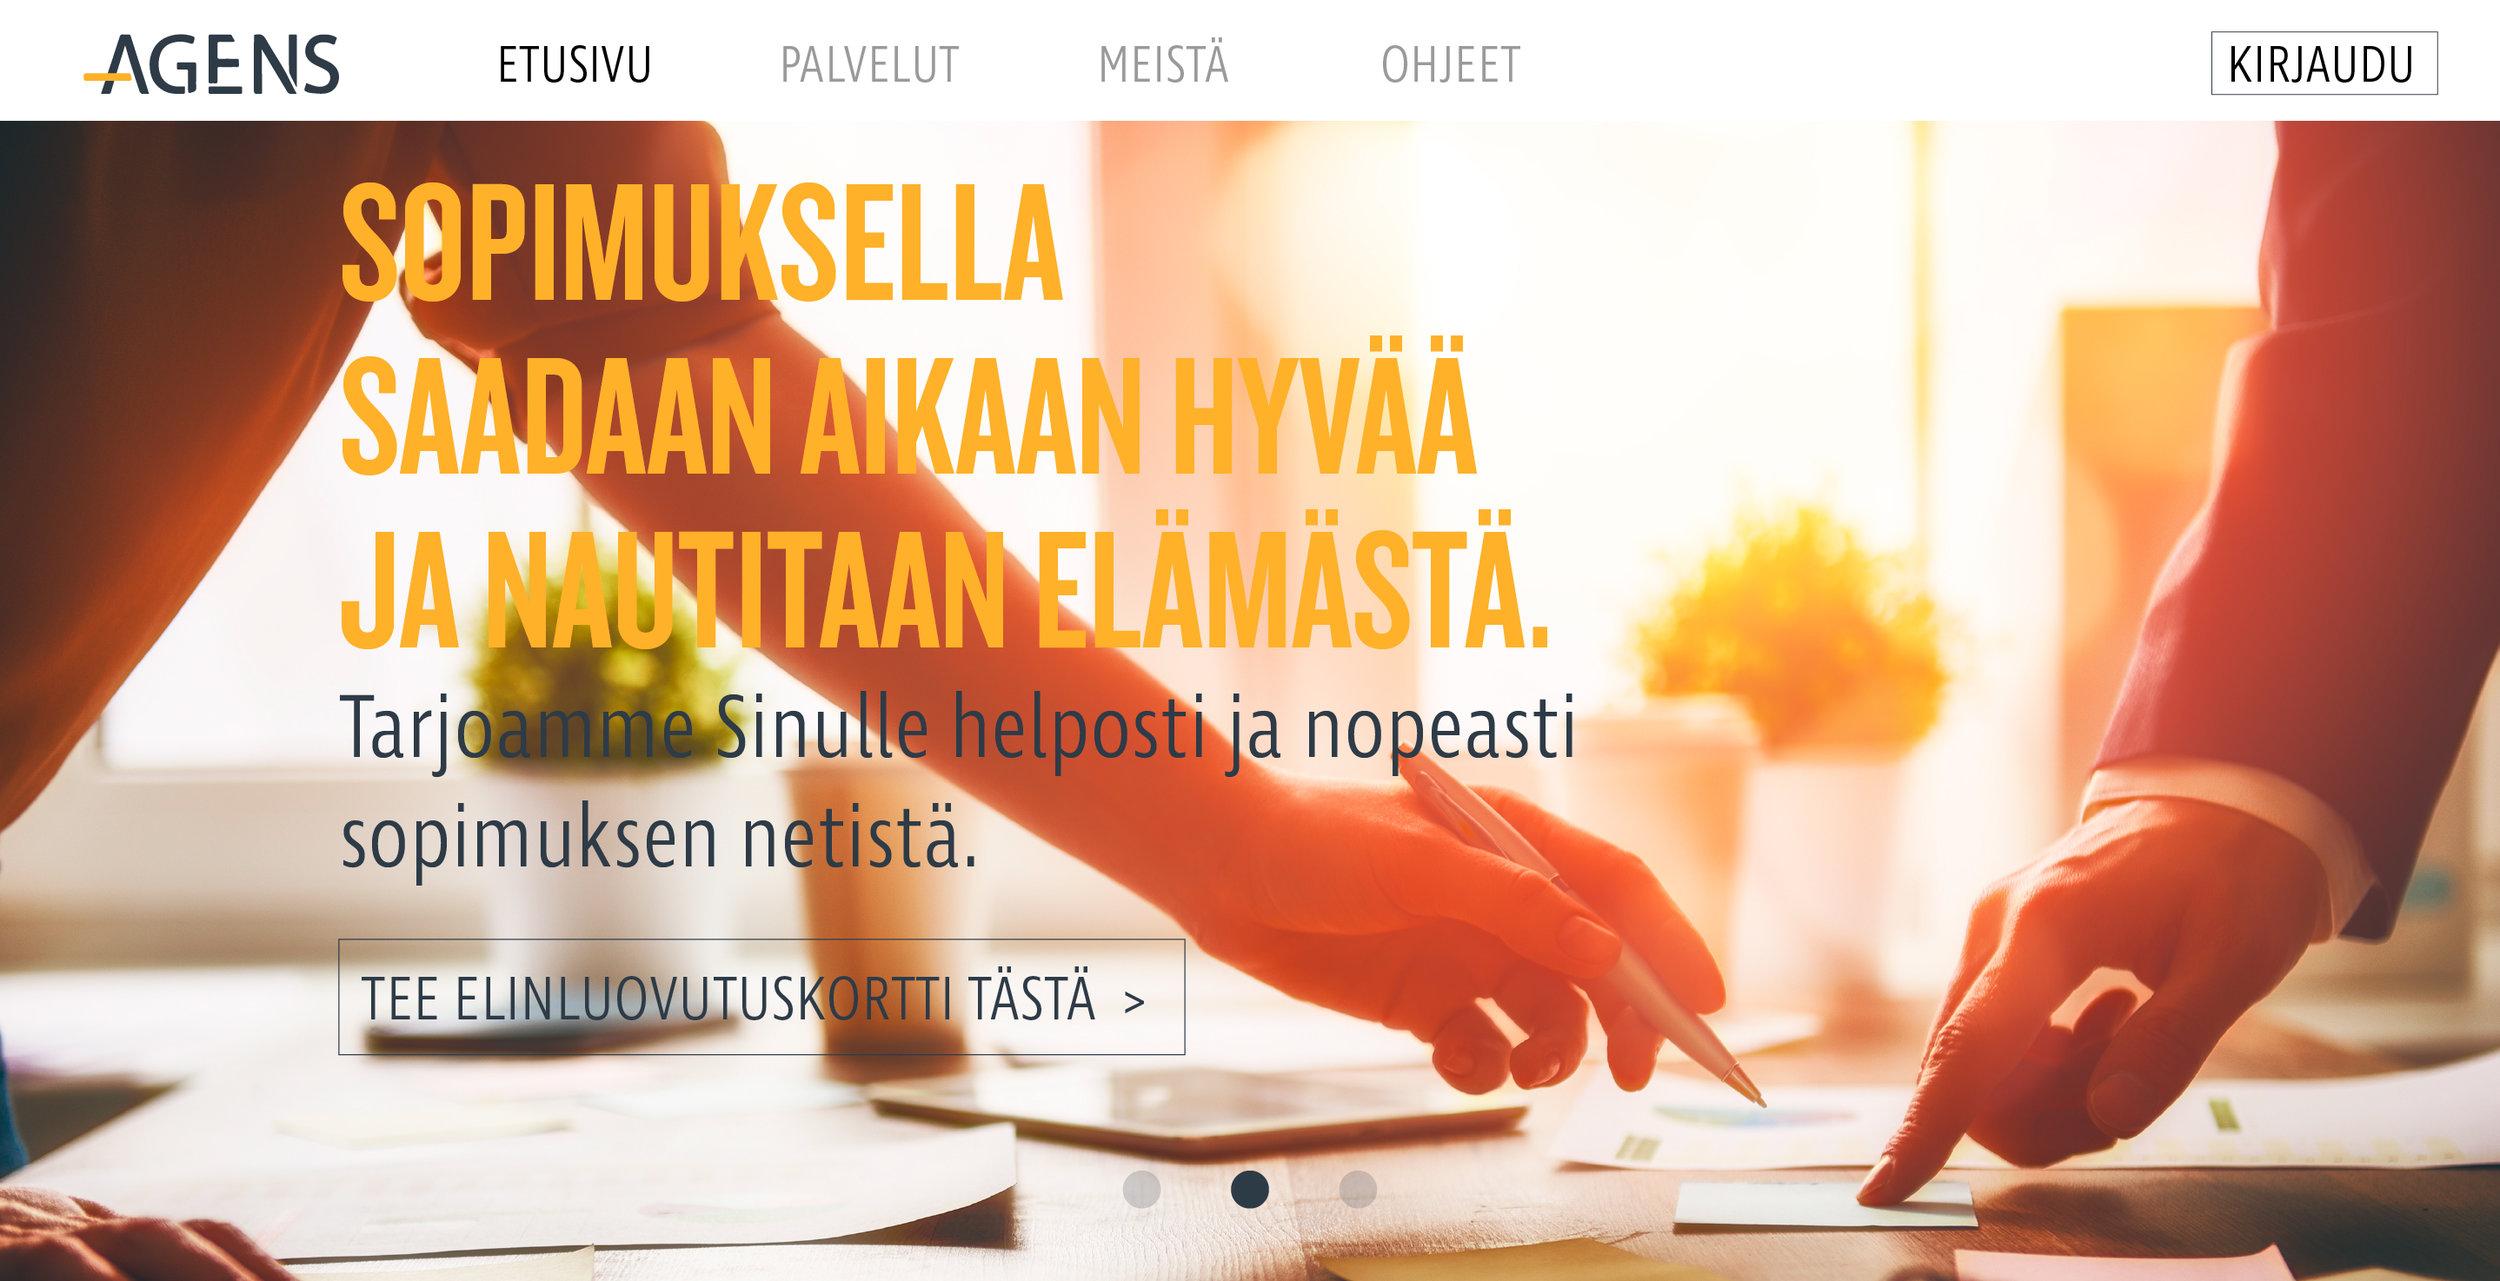 Agens_verkkosivu_03.jpg